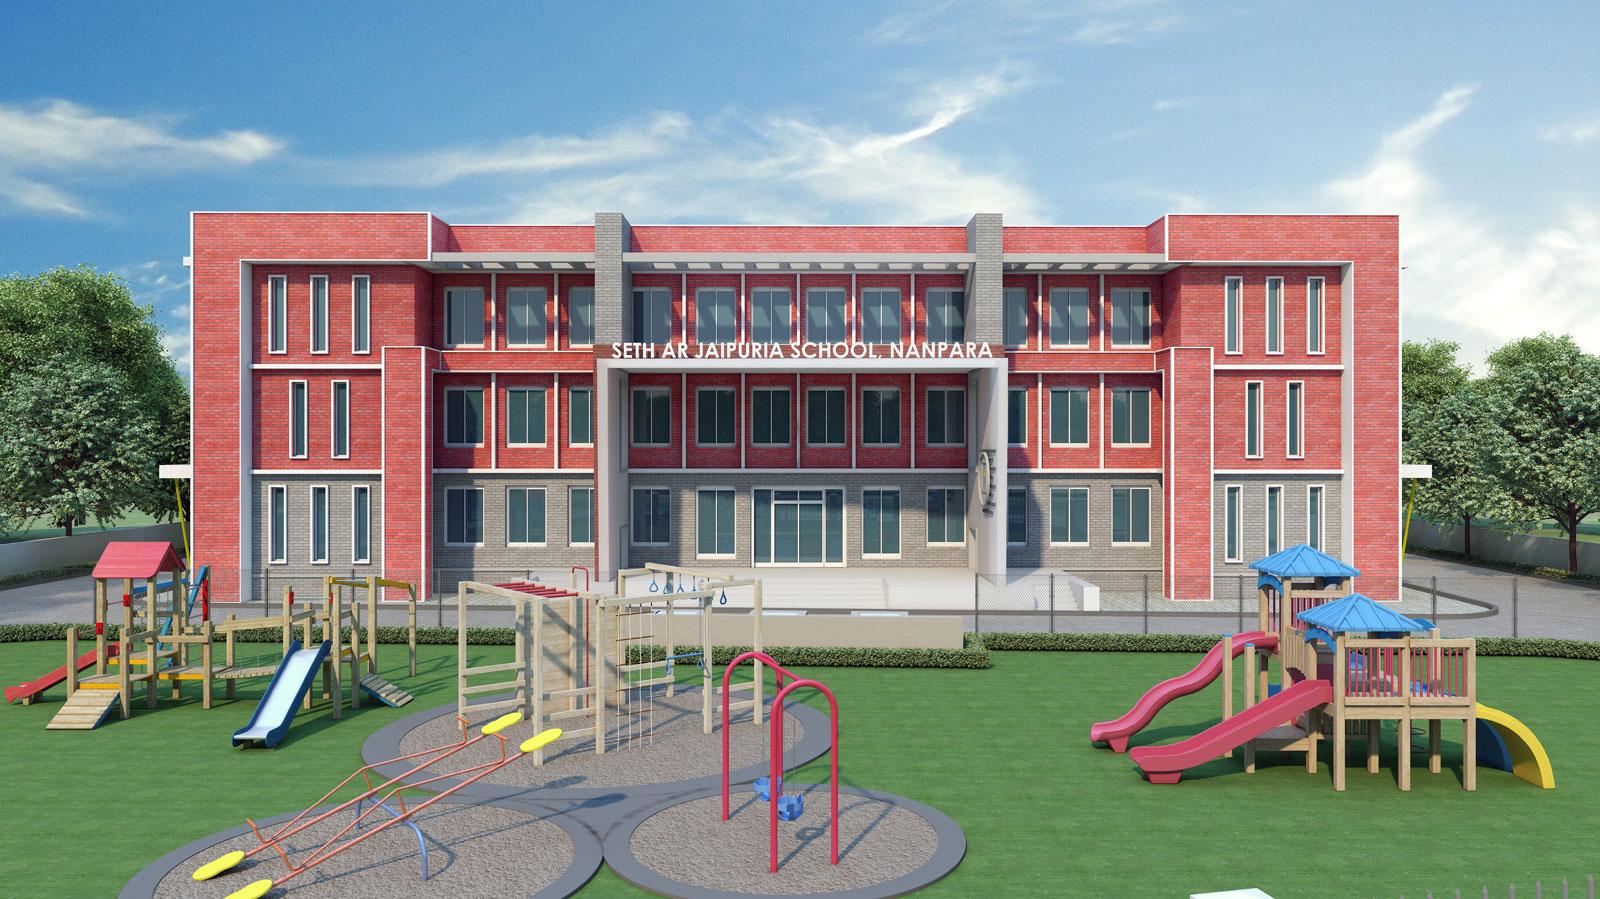 ar-jaipuria-school-portfolio-slide3